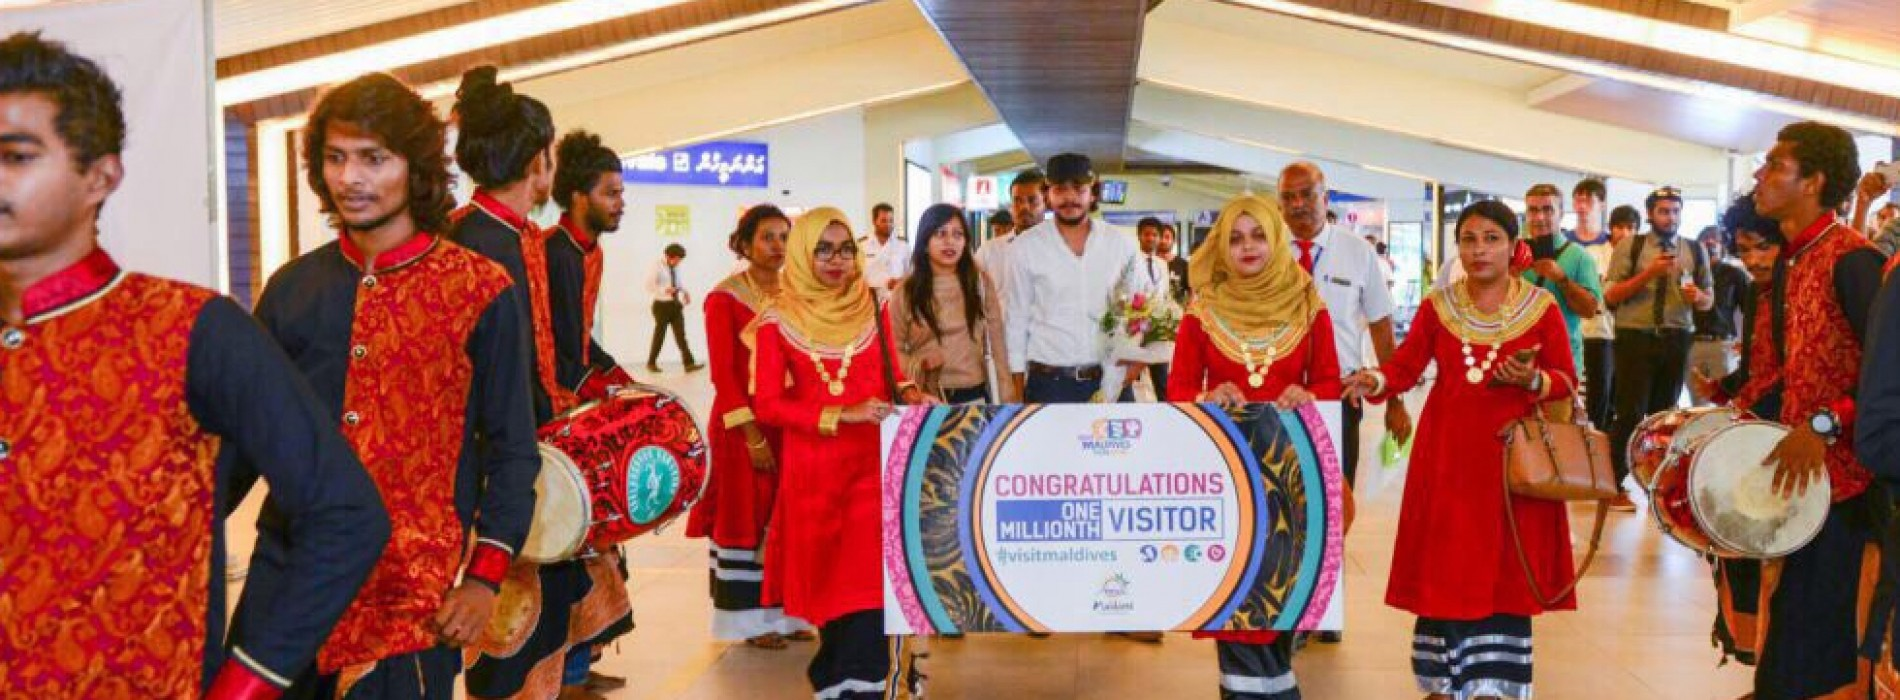 Milestone of 1,000,000th visitor of visit Maldives year 2016